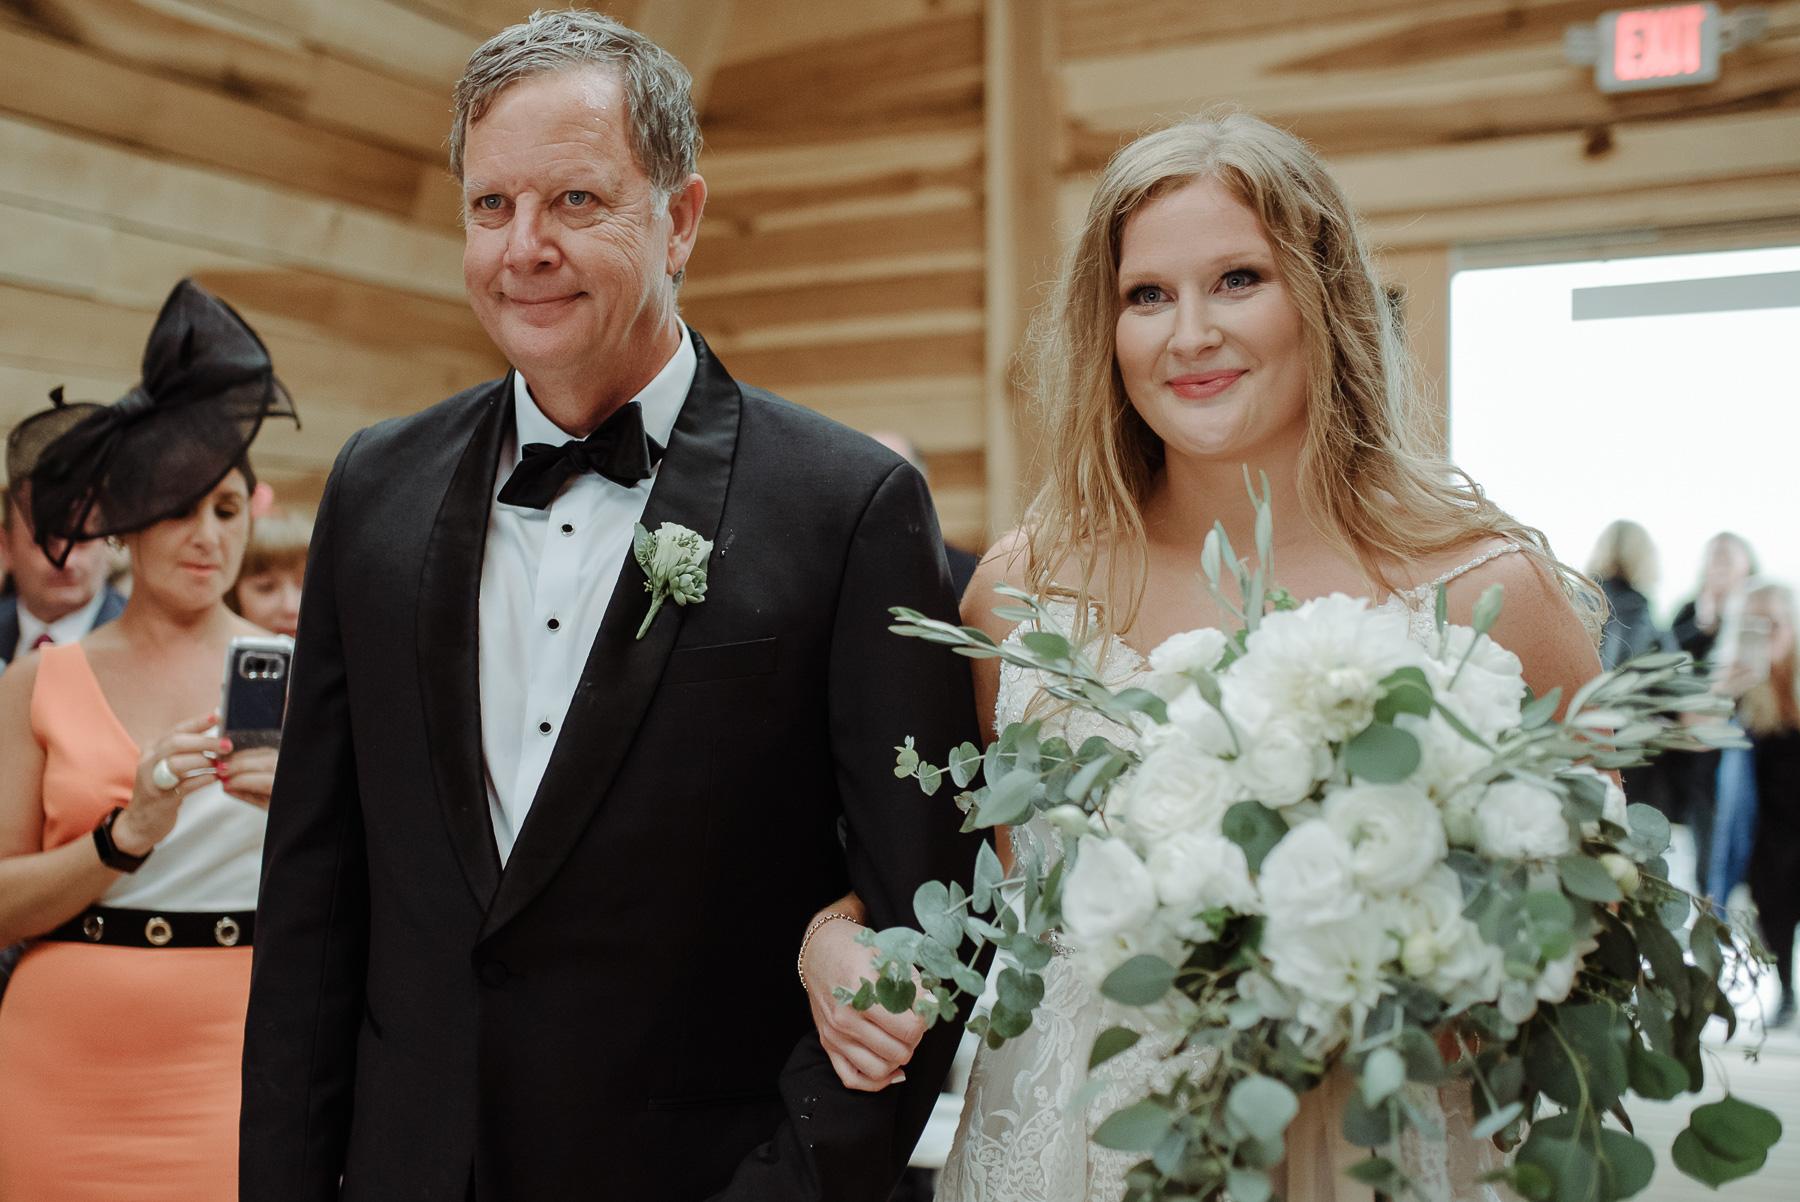 Enowen-wedding-Photography-Lyndly-Liam-overlook-barn-244.jpg